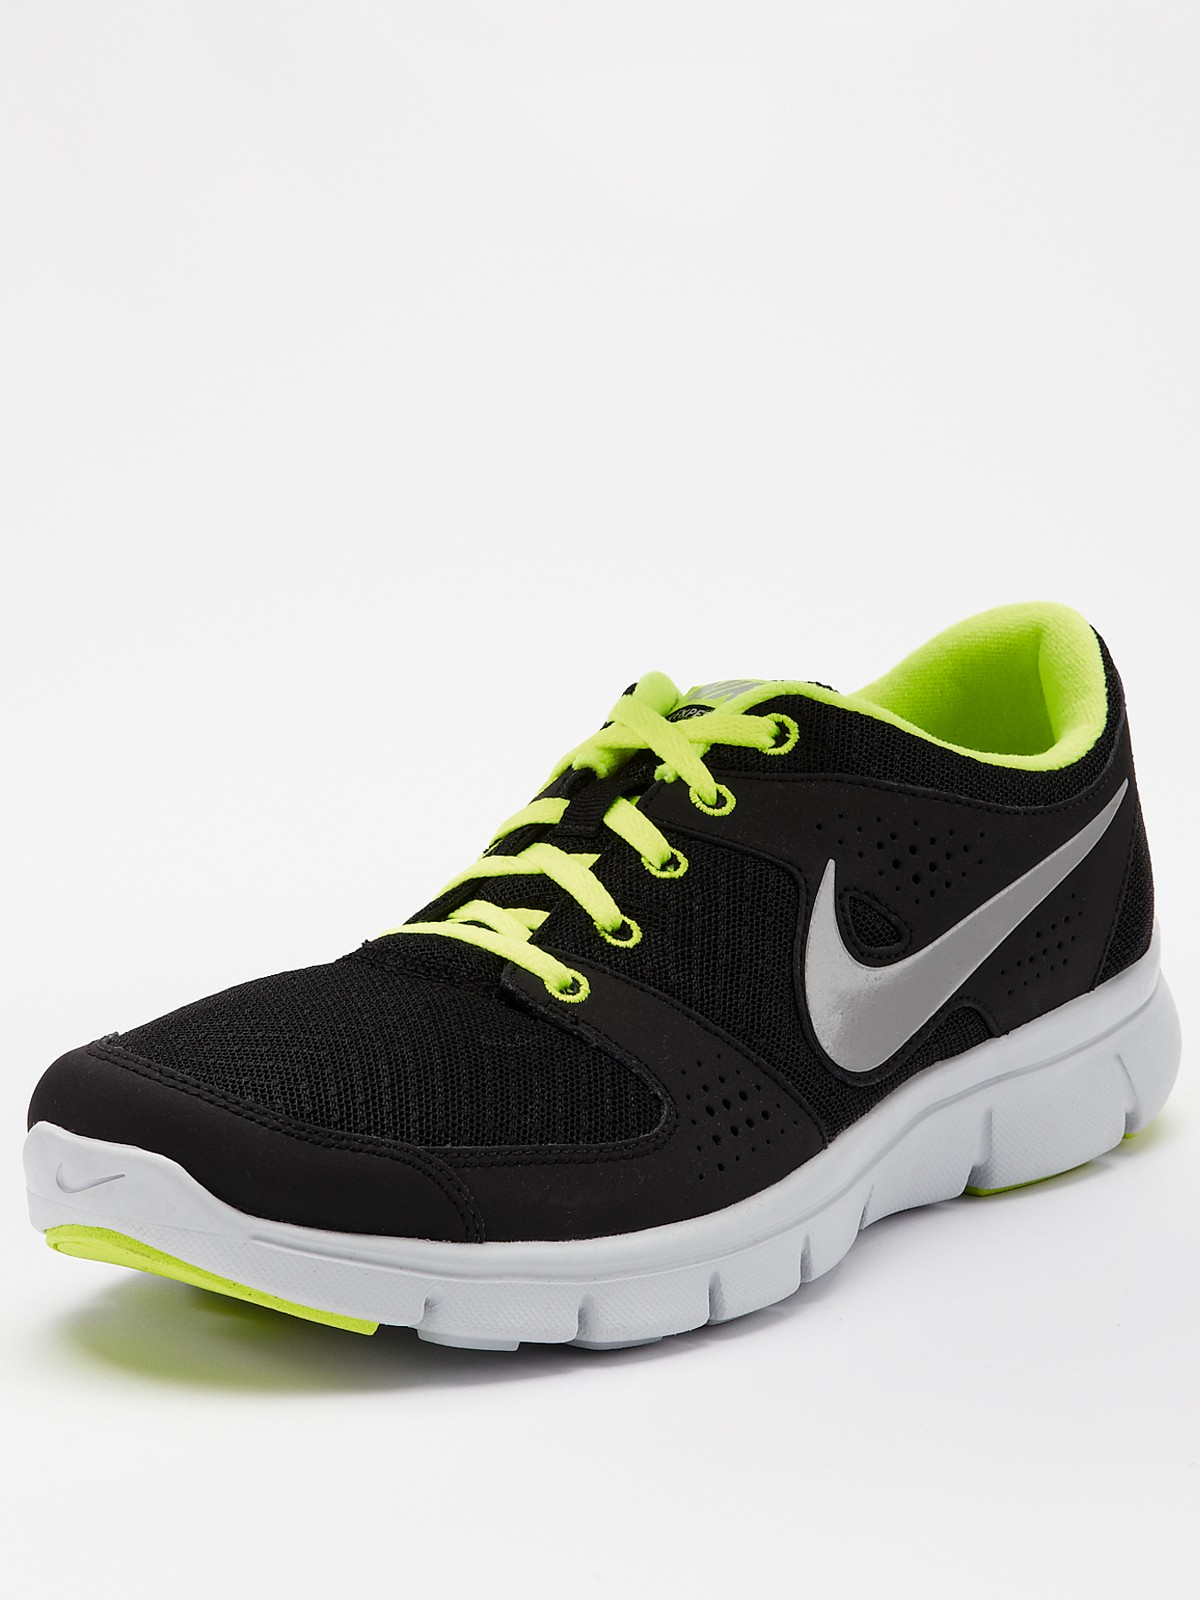 nike nike flex experience run mens running shoes in green